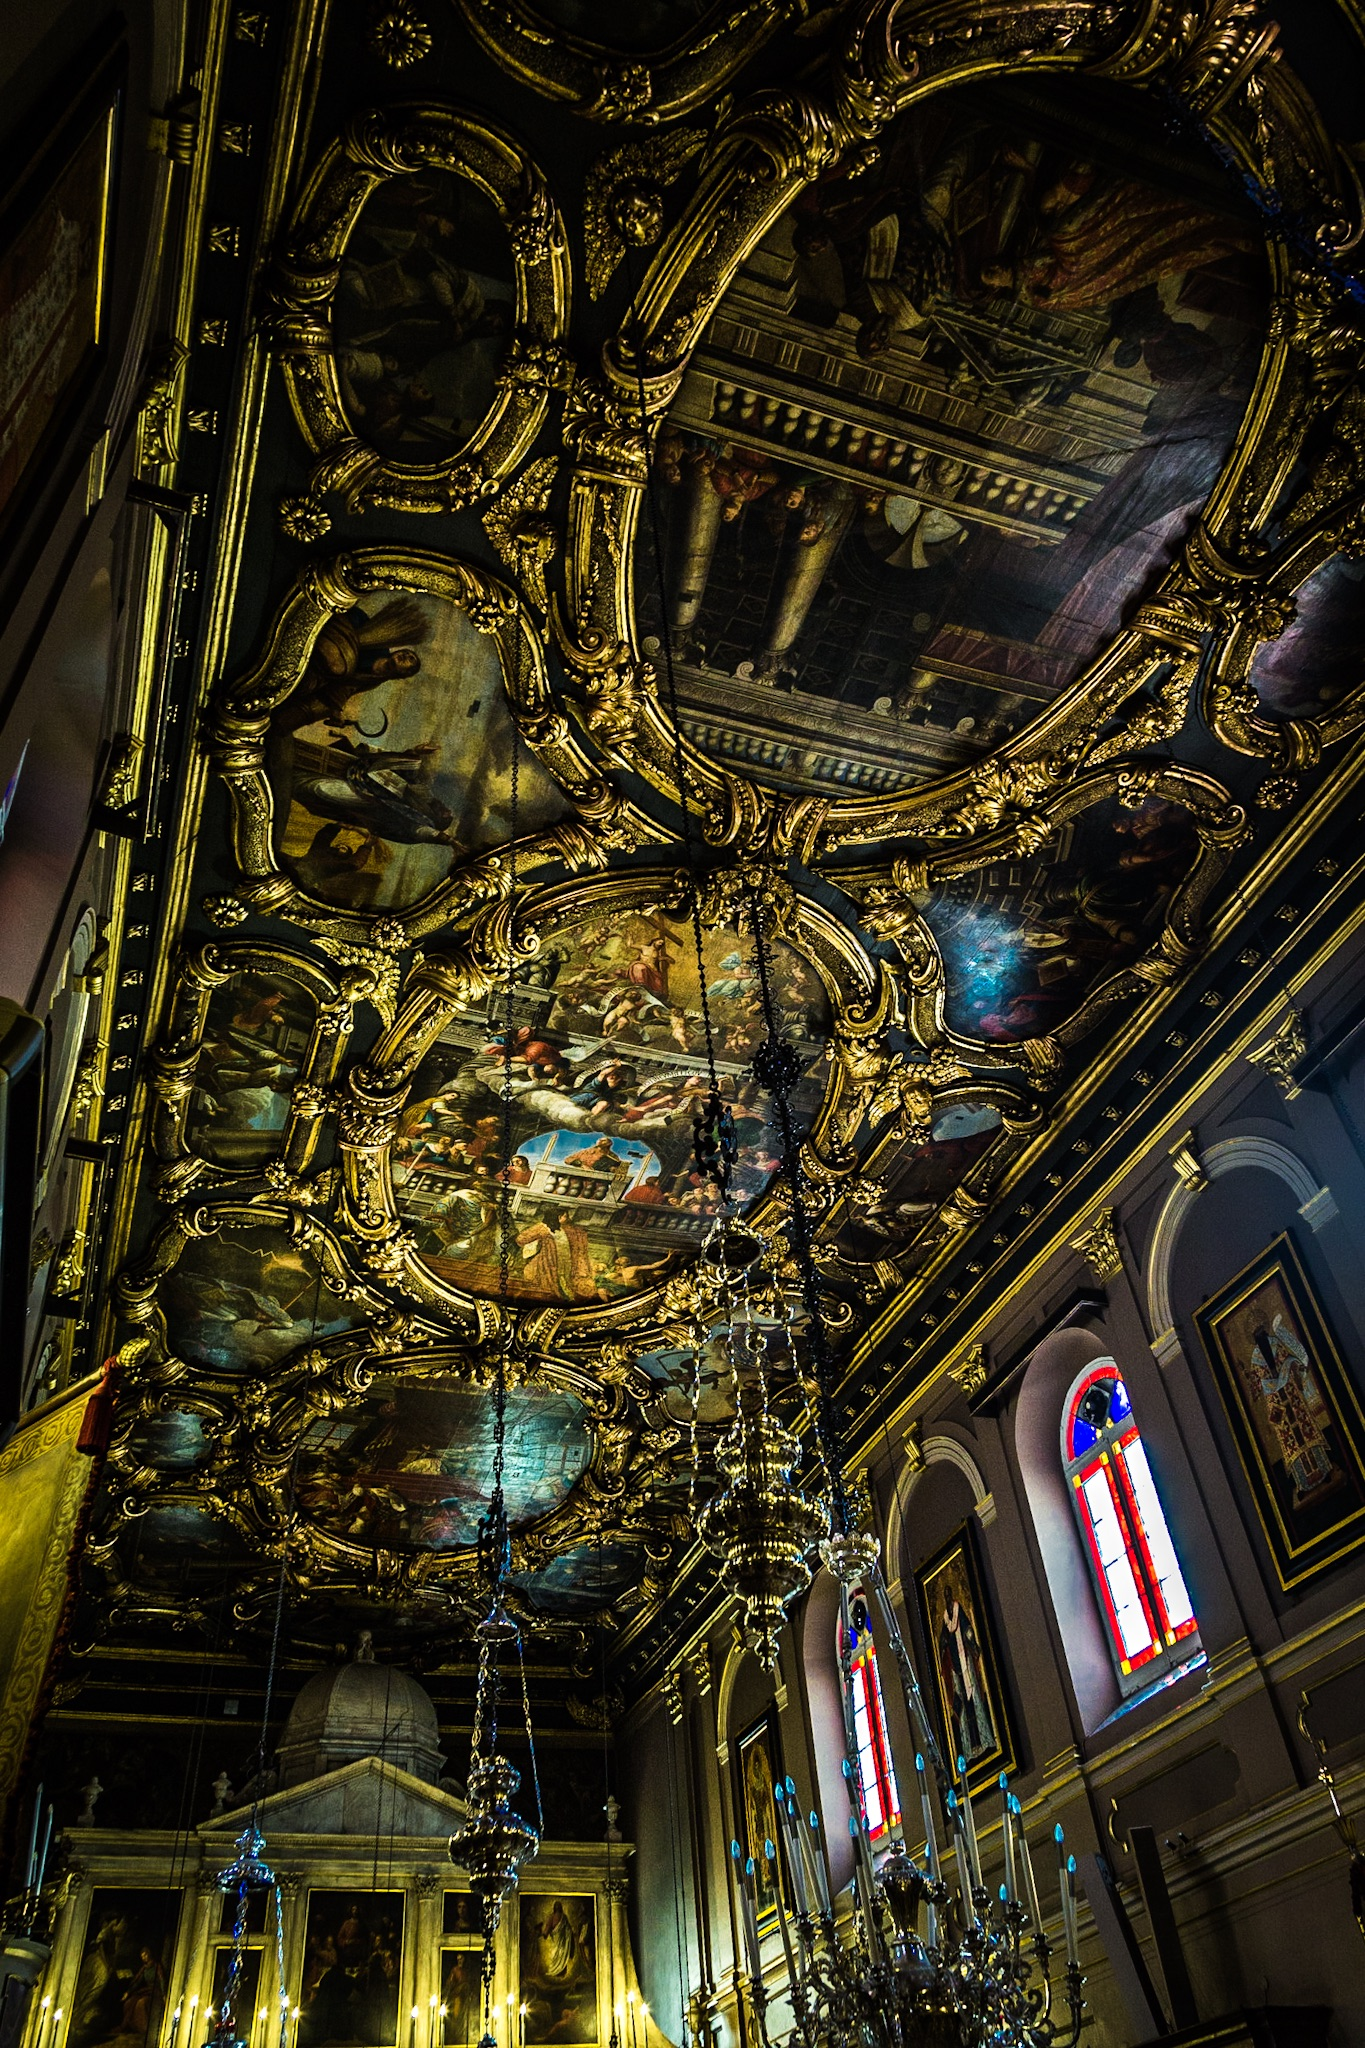 Church Ceiling, Corfu, Greece, by Rick McEvoy interior photographer